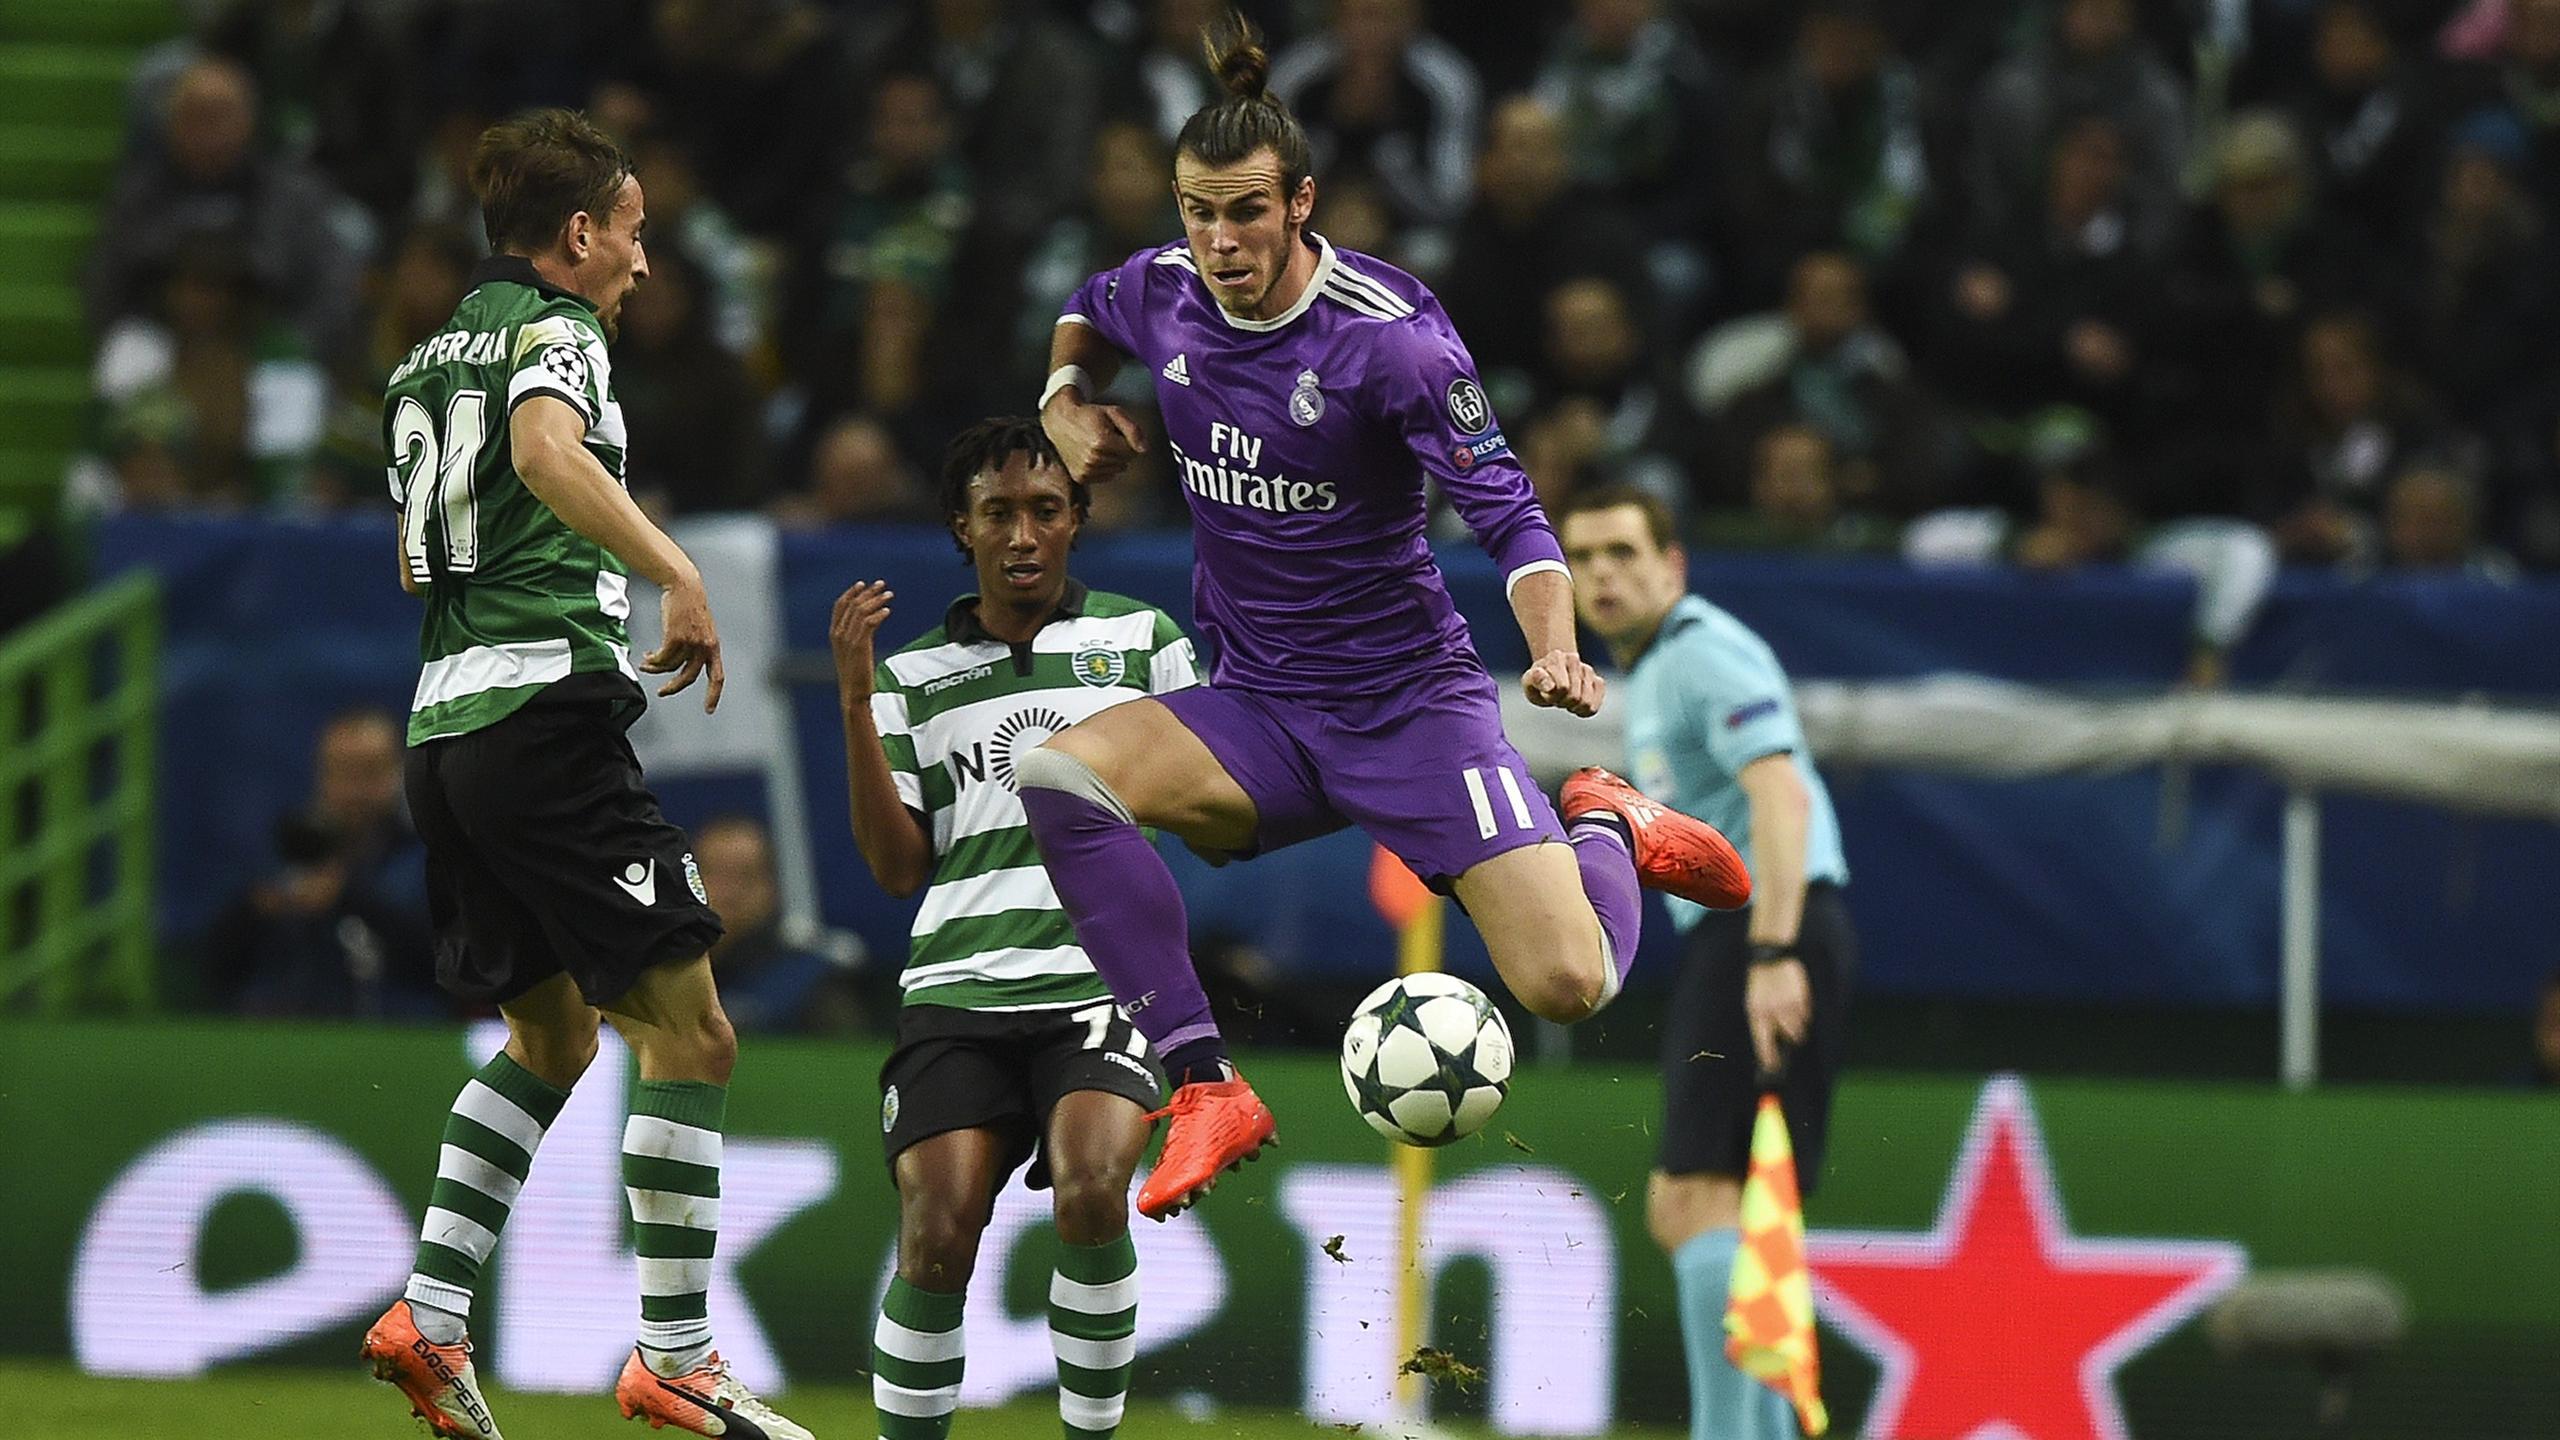 Gareth Bale (Sporting vs. Real Madrid)